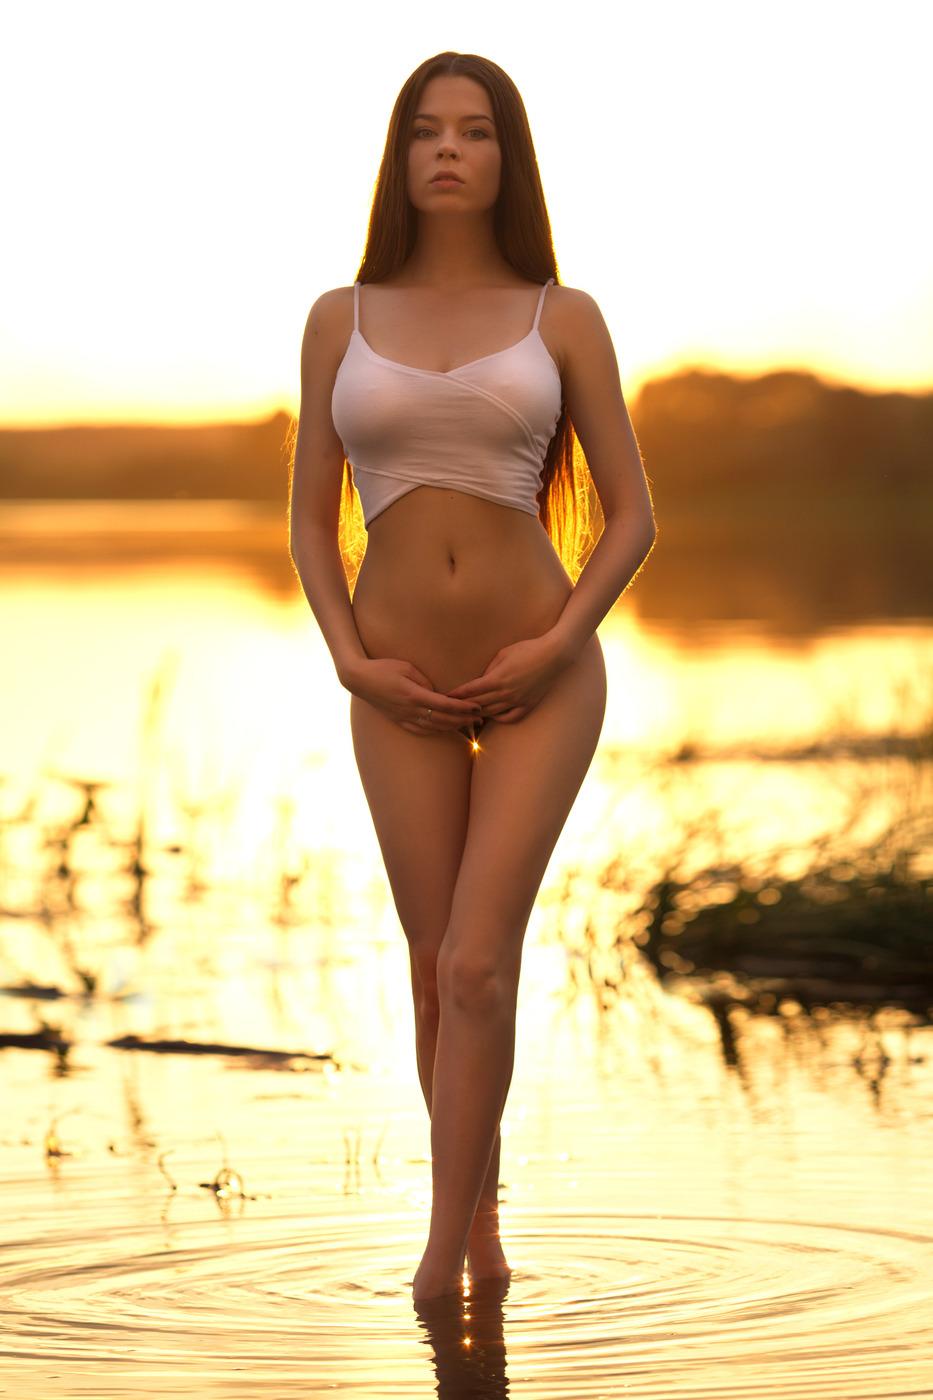 Lesbian Cougars Tumblr Beautiful best free selfshot galleries | lovemybeaut - hot sexy nude girl